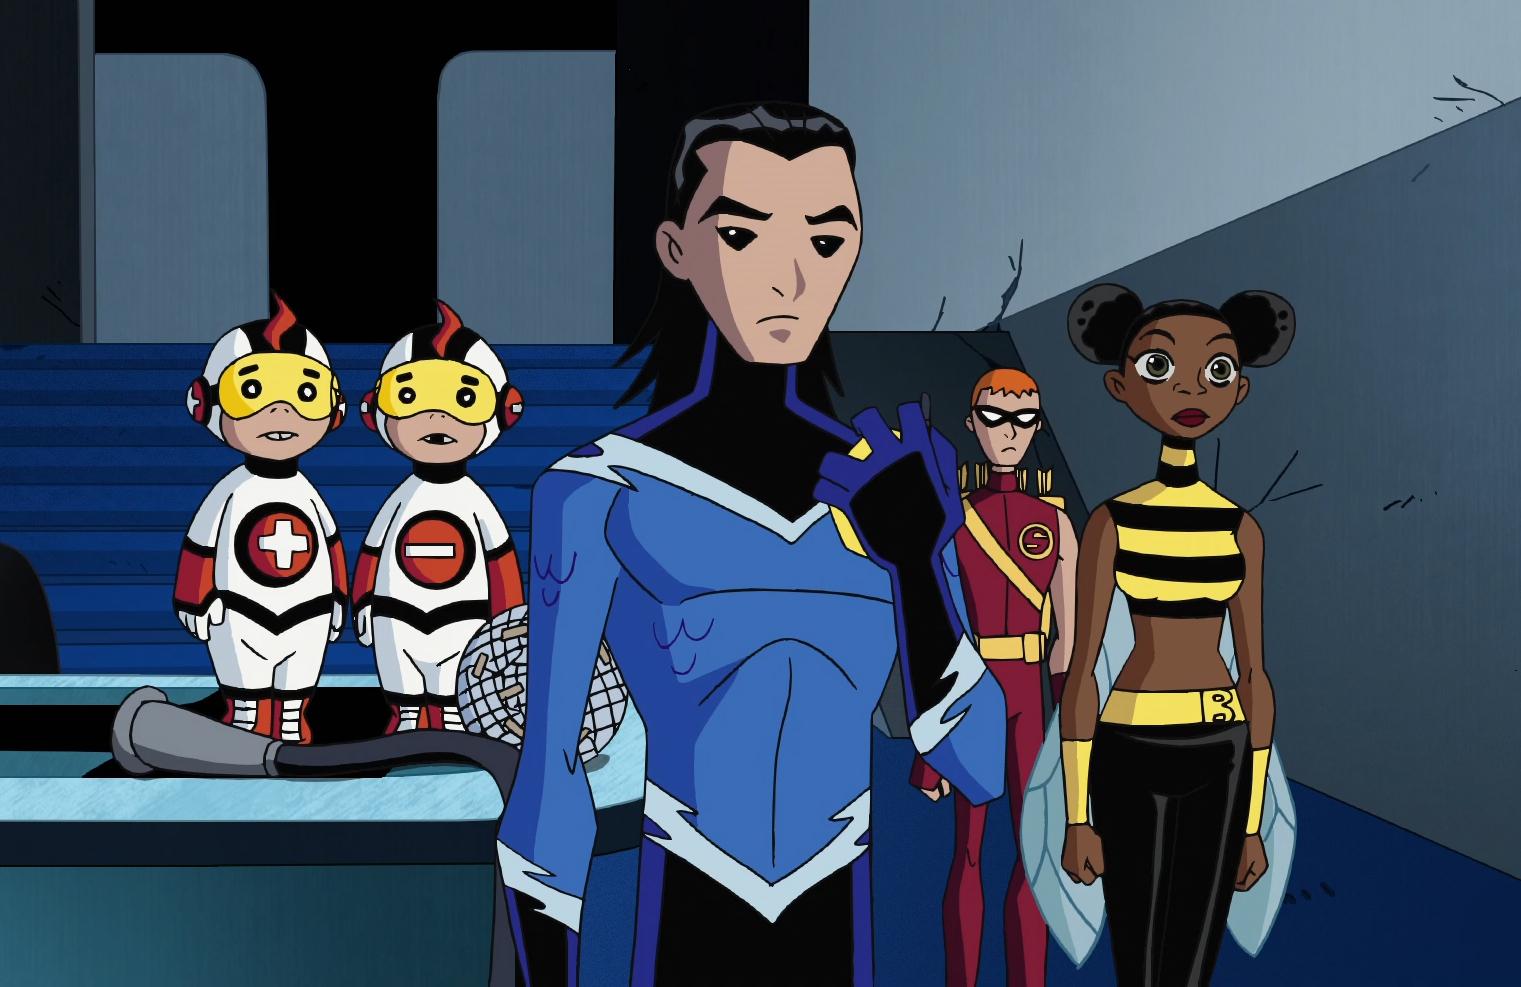 Teen Titans (TV Series) Episode: Titans East, Part II